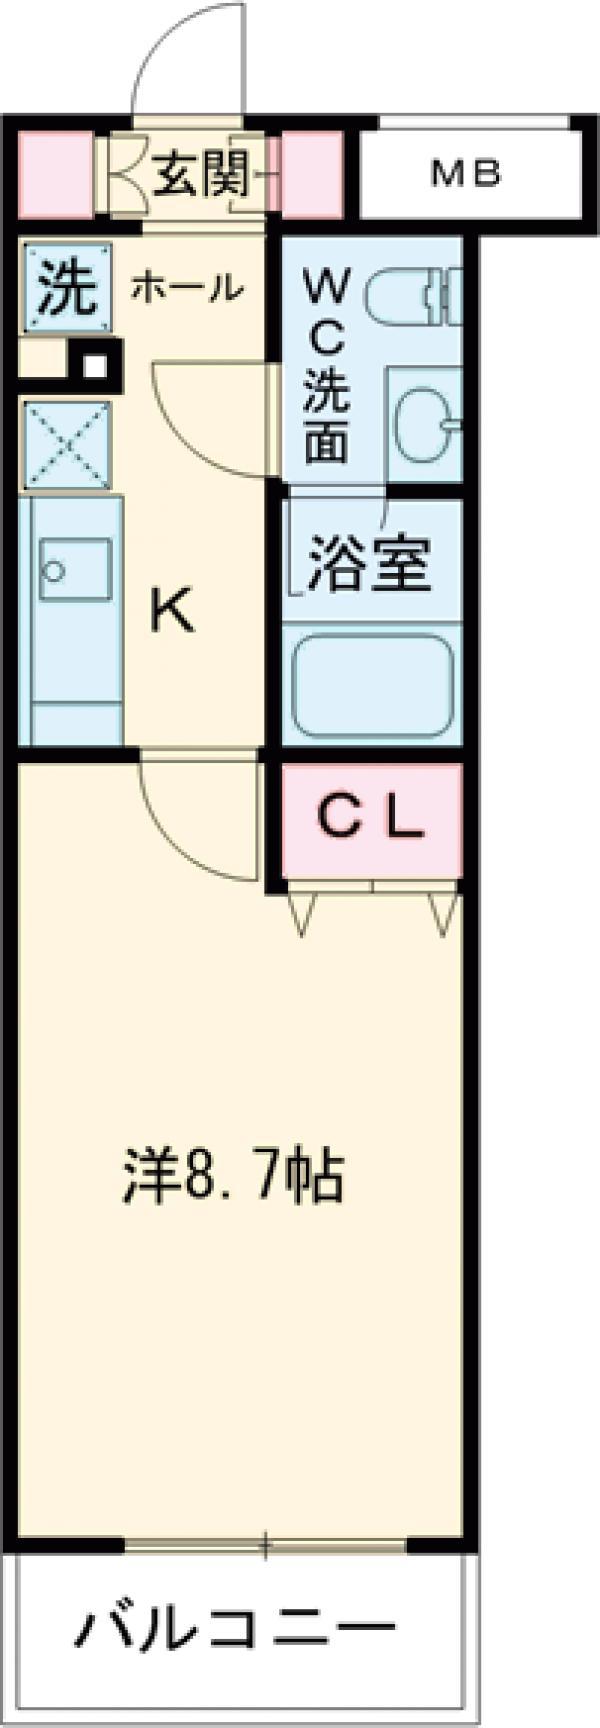 AZEST西高島平・502号室の間取り